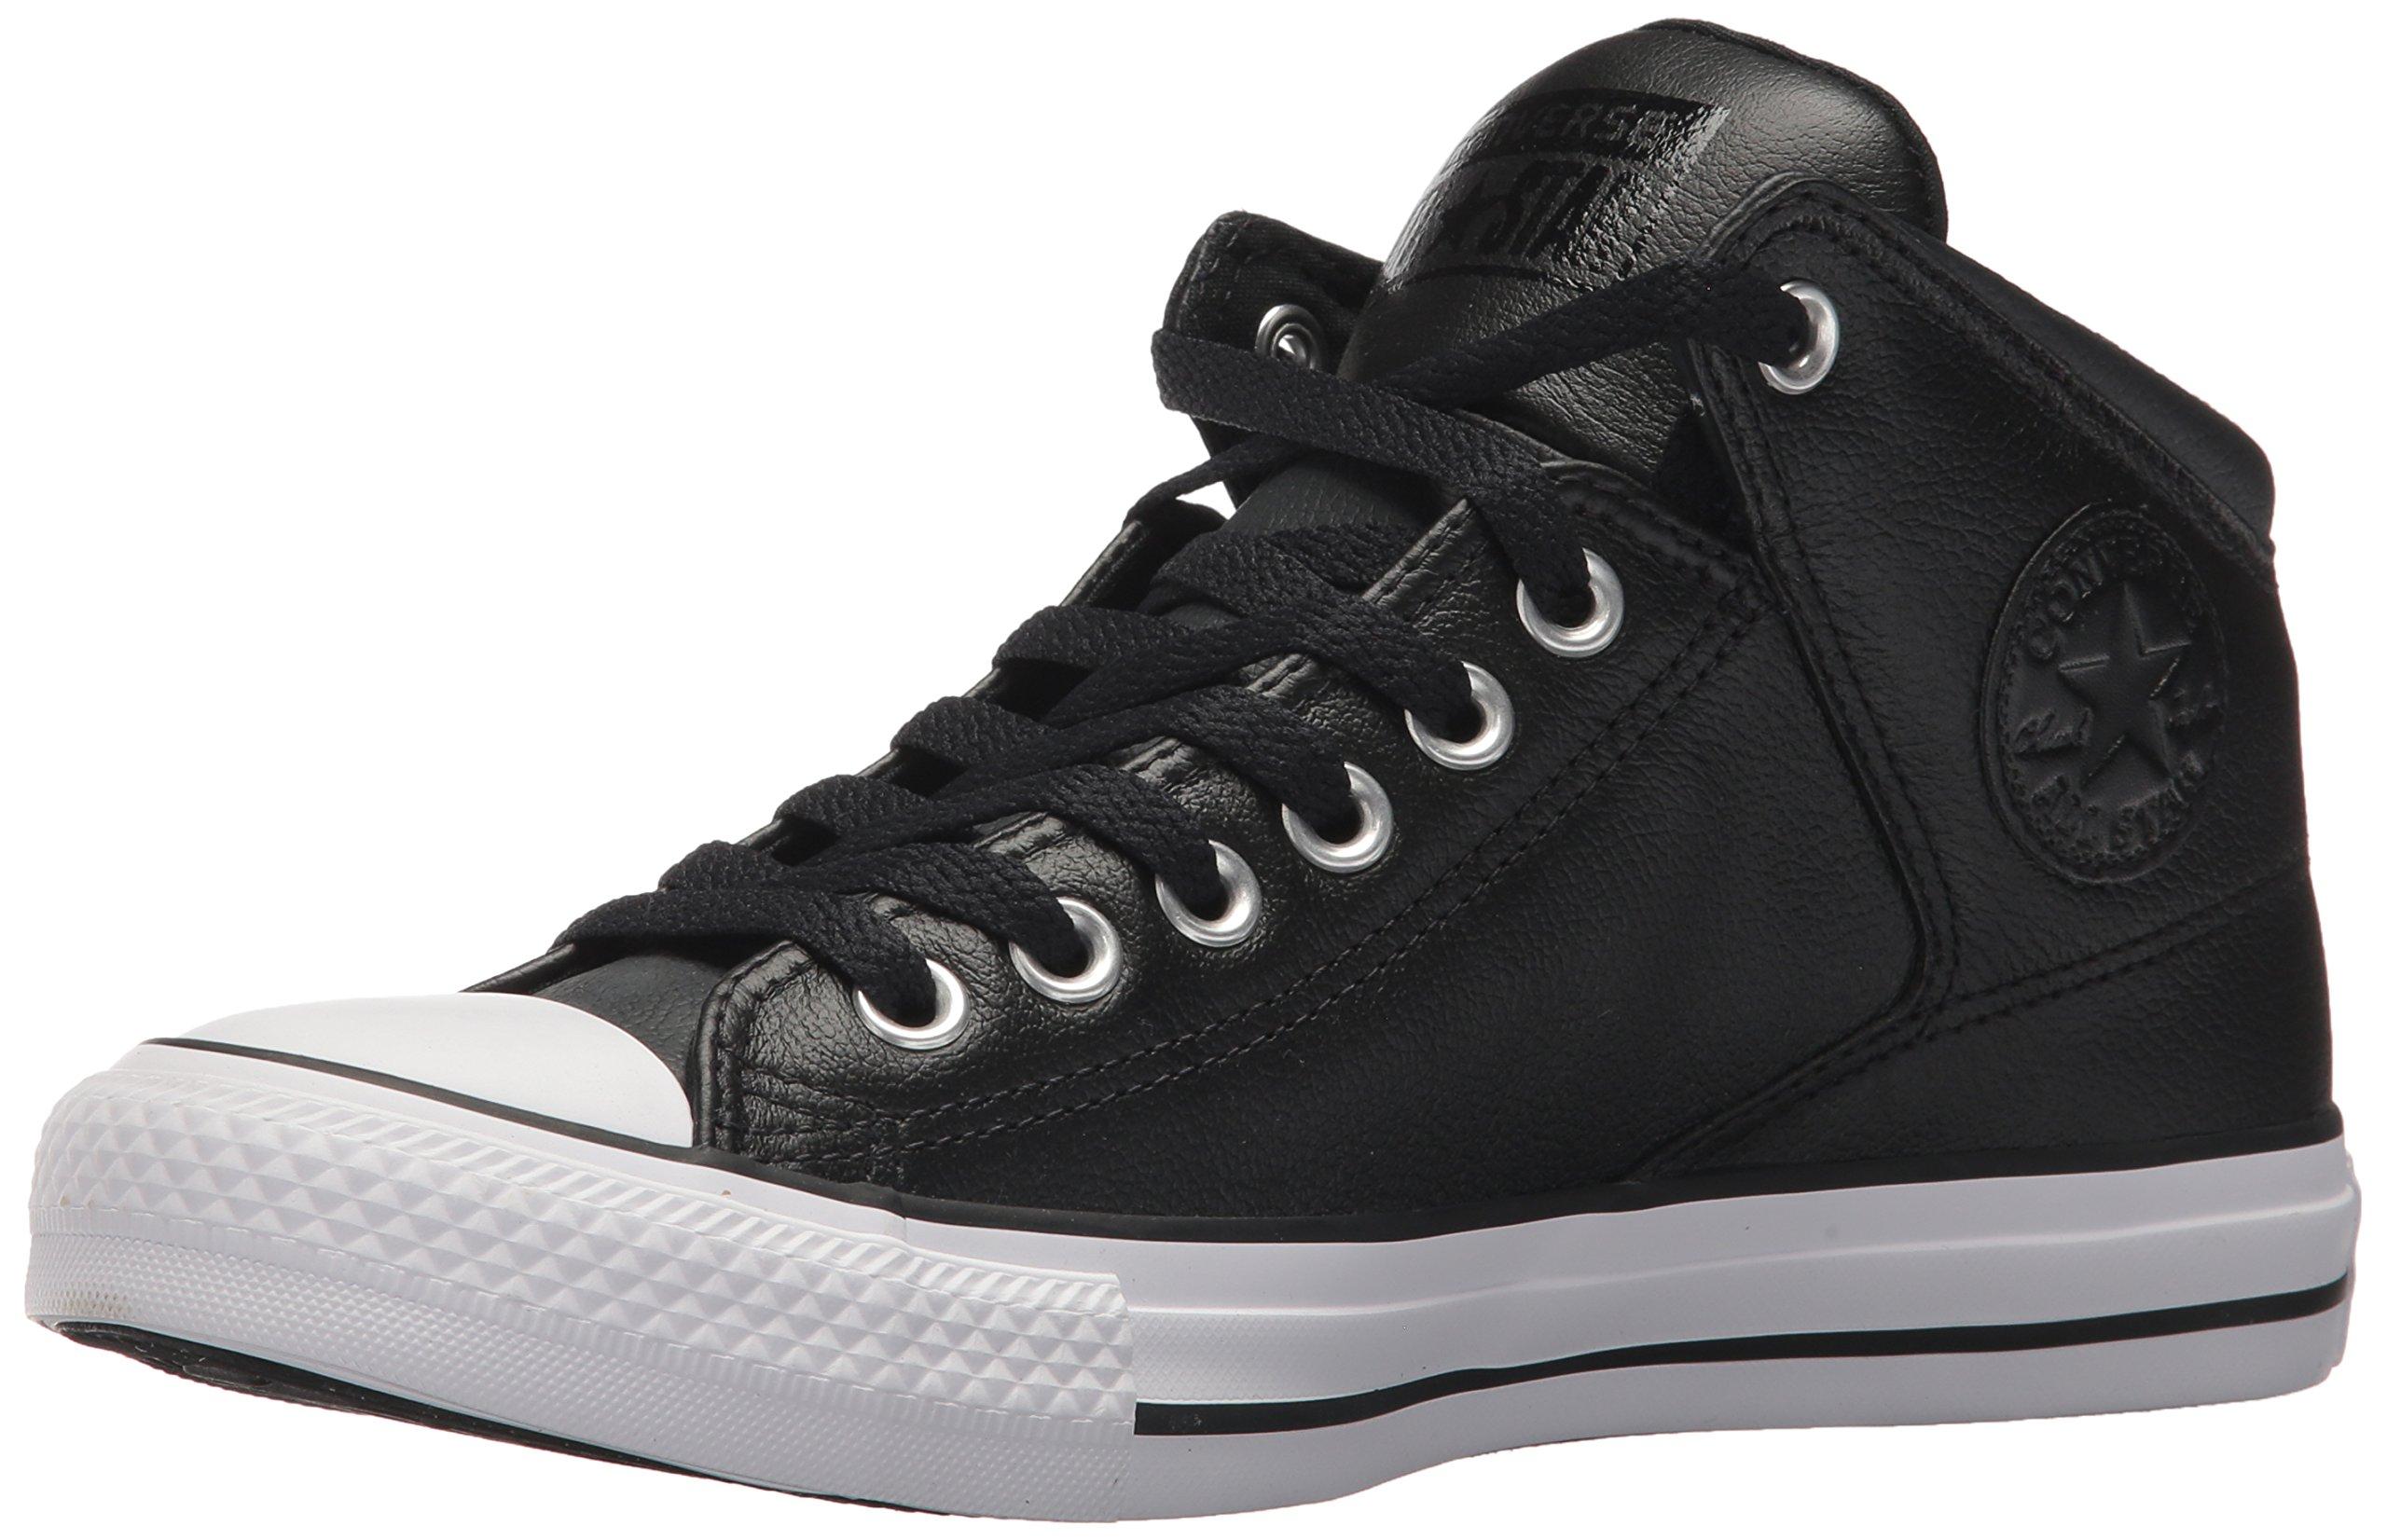 converse shoes mens near me